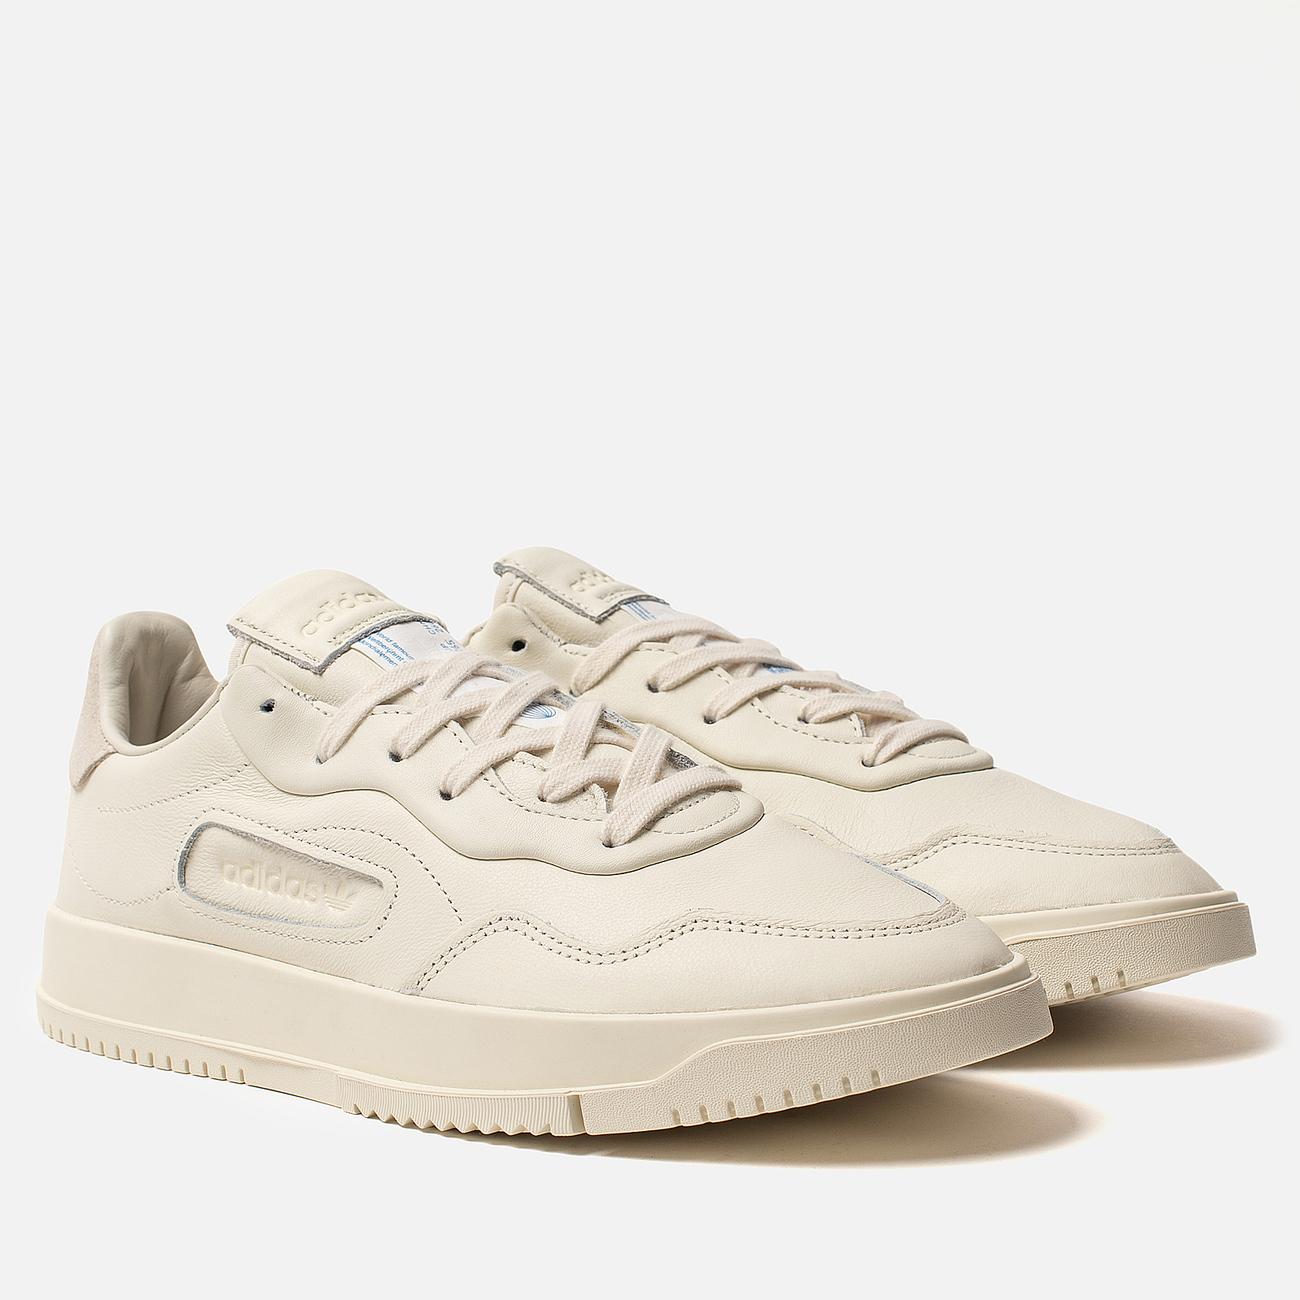 Мужские кроссовки adidas Originals Supercourt Premiere Off White/Off White/Off White